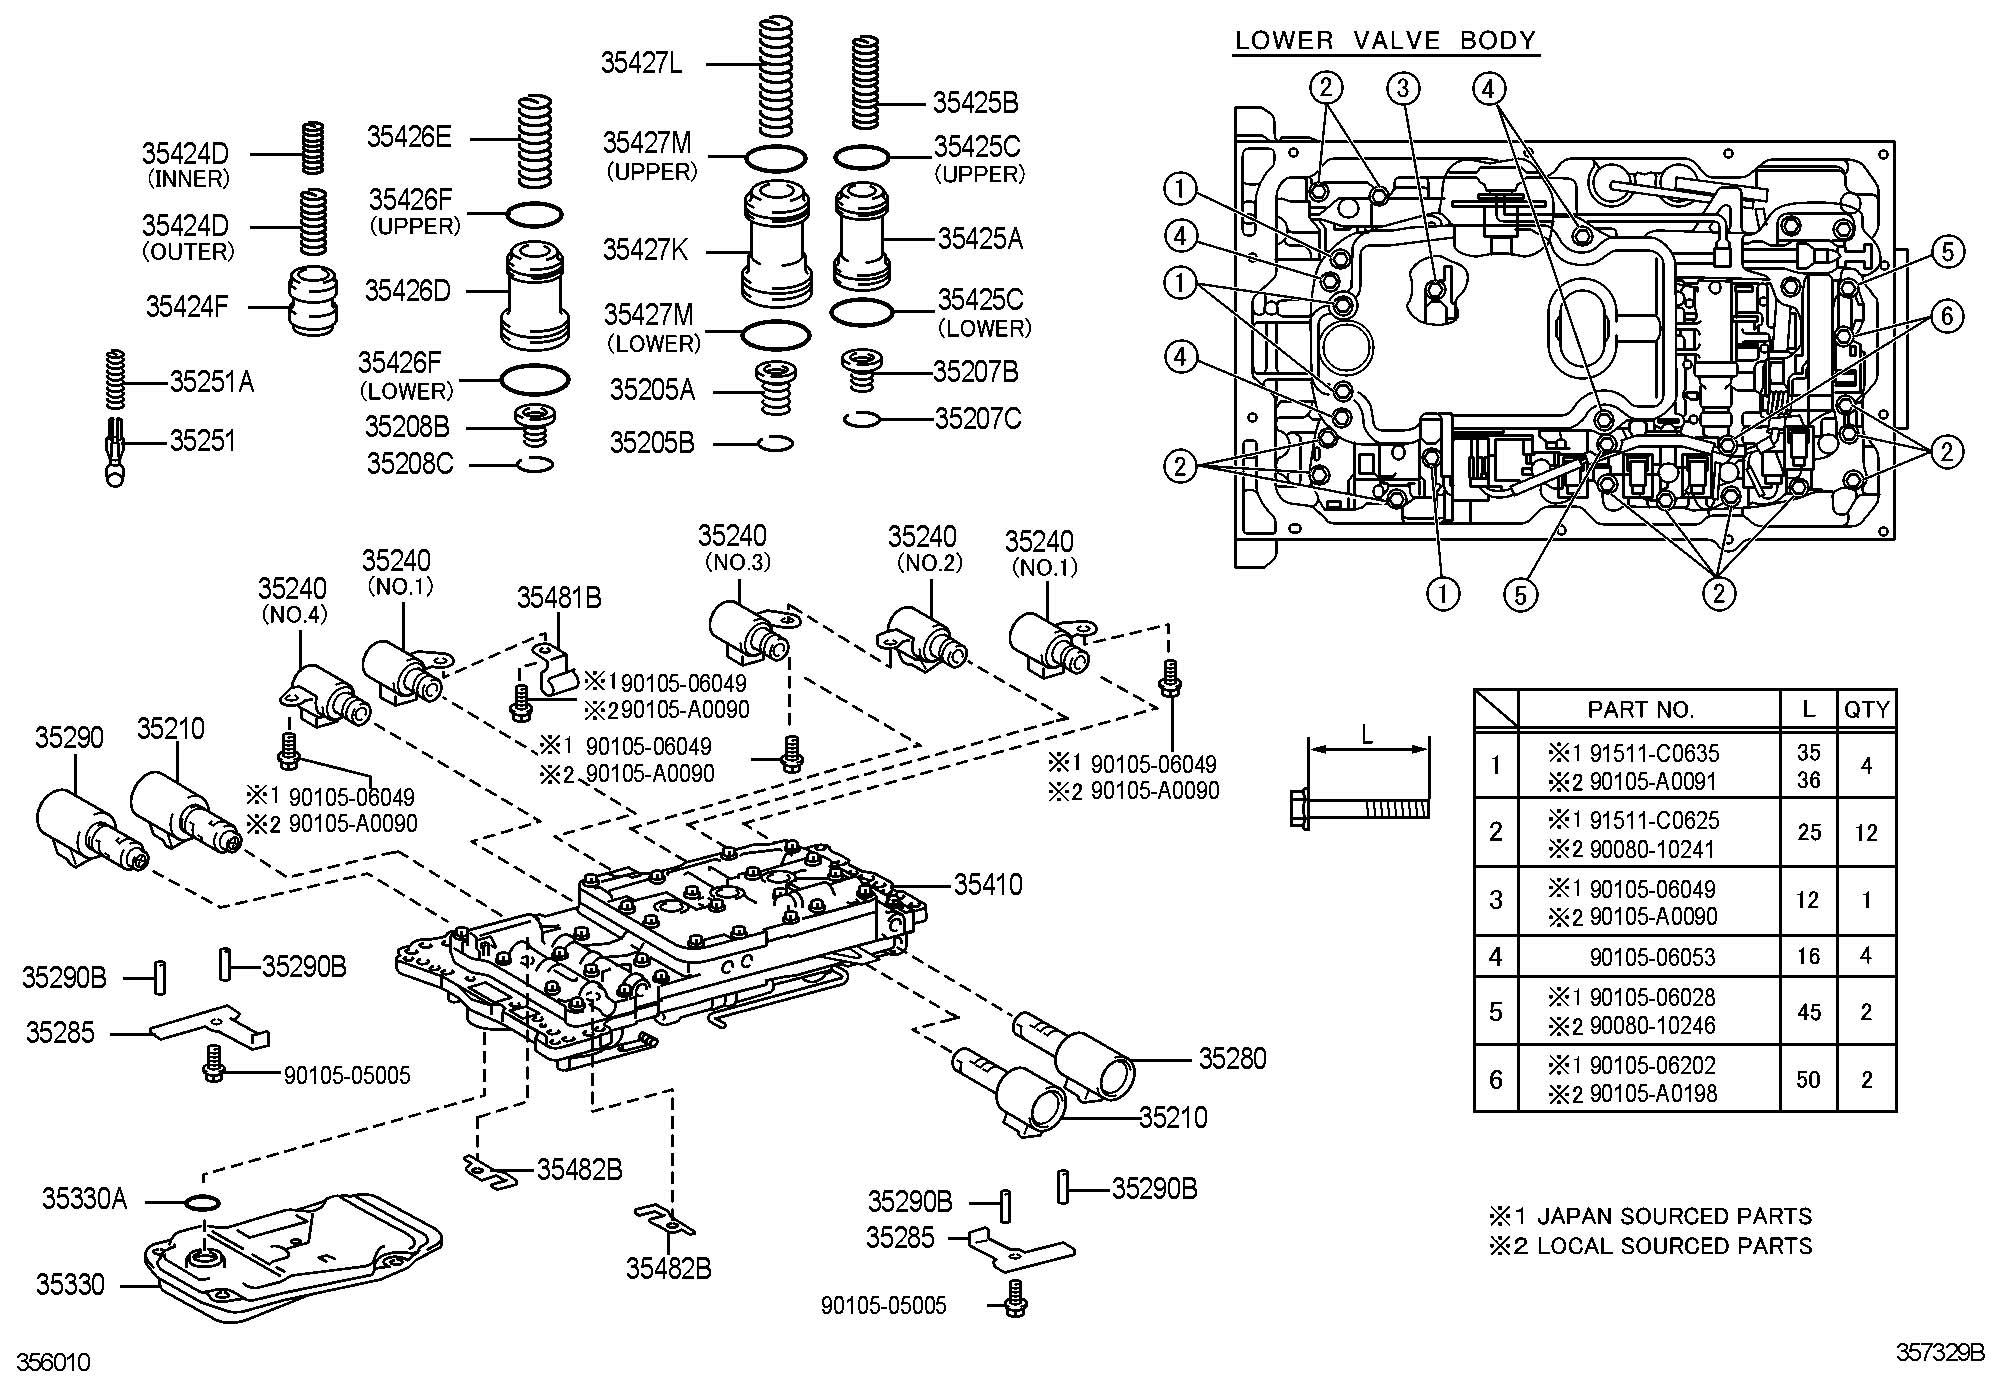 help electrical diagram gx 470 club lexus forums auto. Black Bedroom Furniture Sets. Home Design Ideas